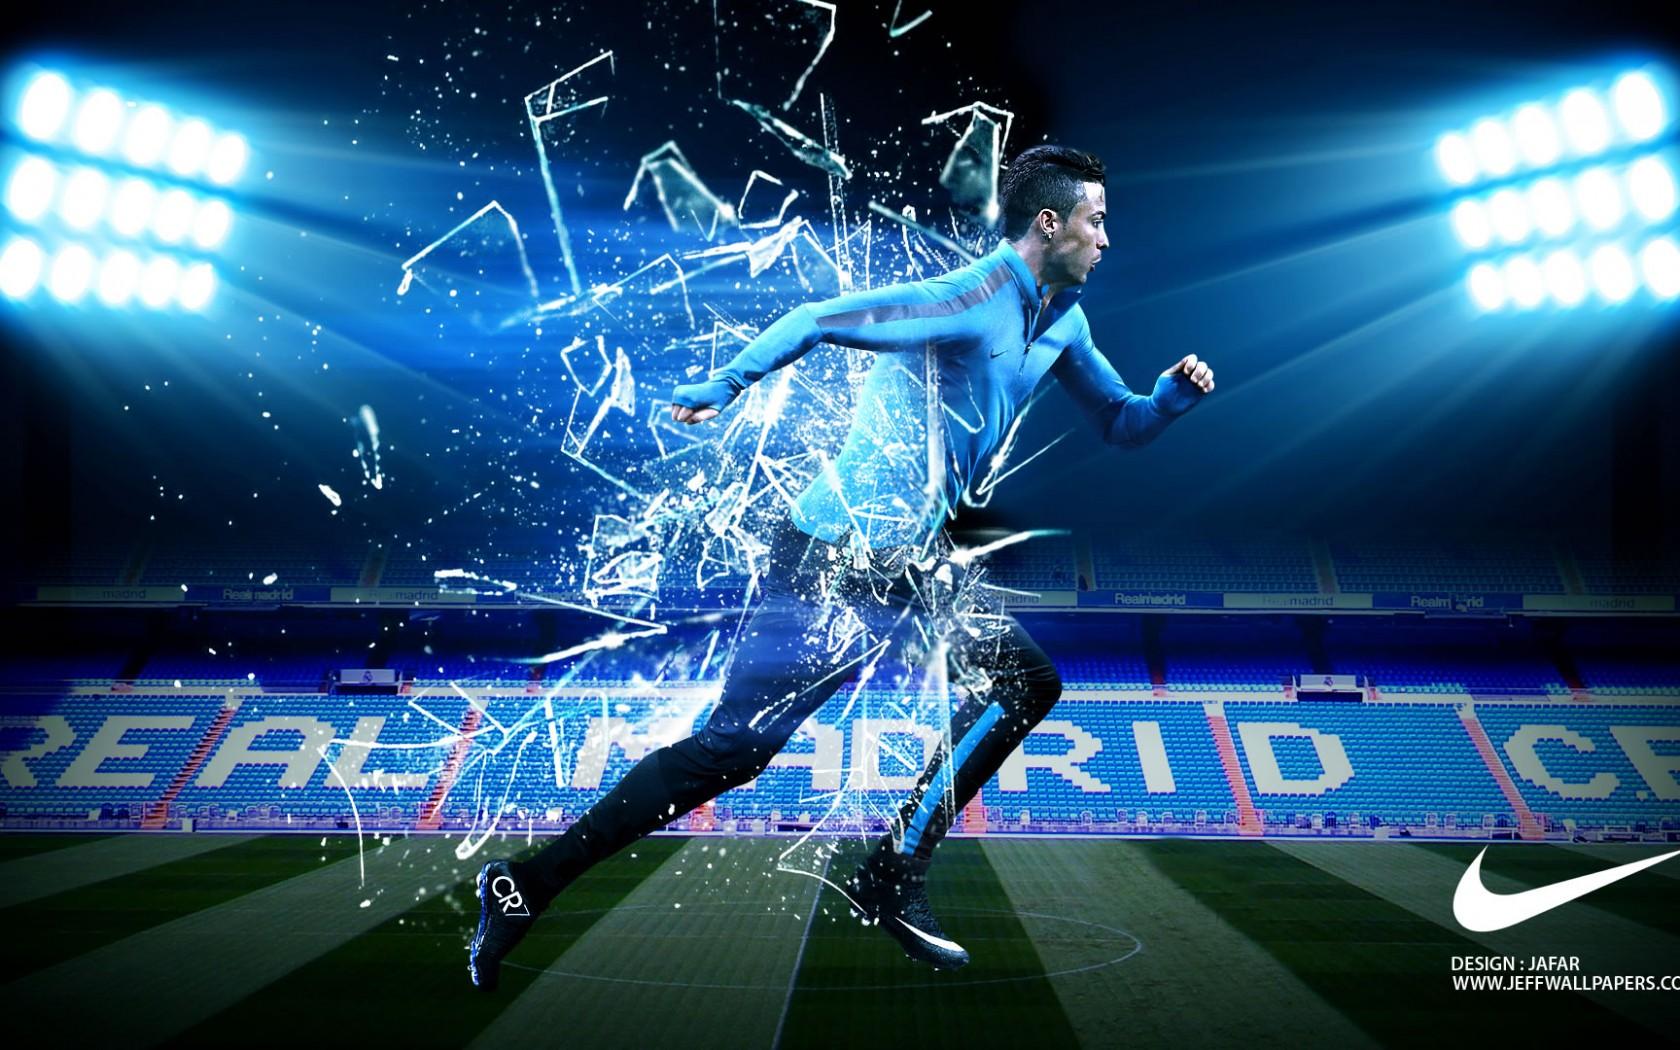 Real Madrid Hd Wallpapers 3d Cristiano Ronaldo Nike Wallpaper By Jafarjeef Cristiano